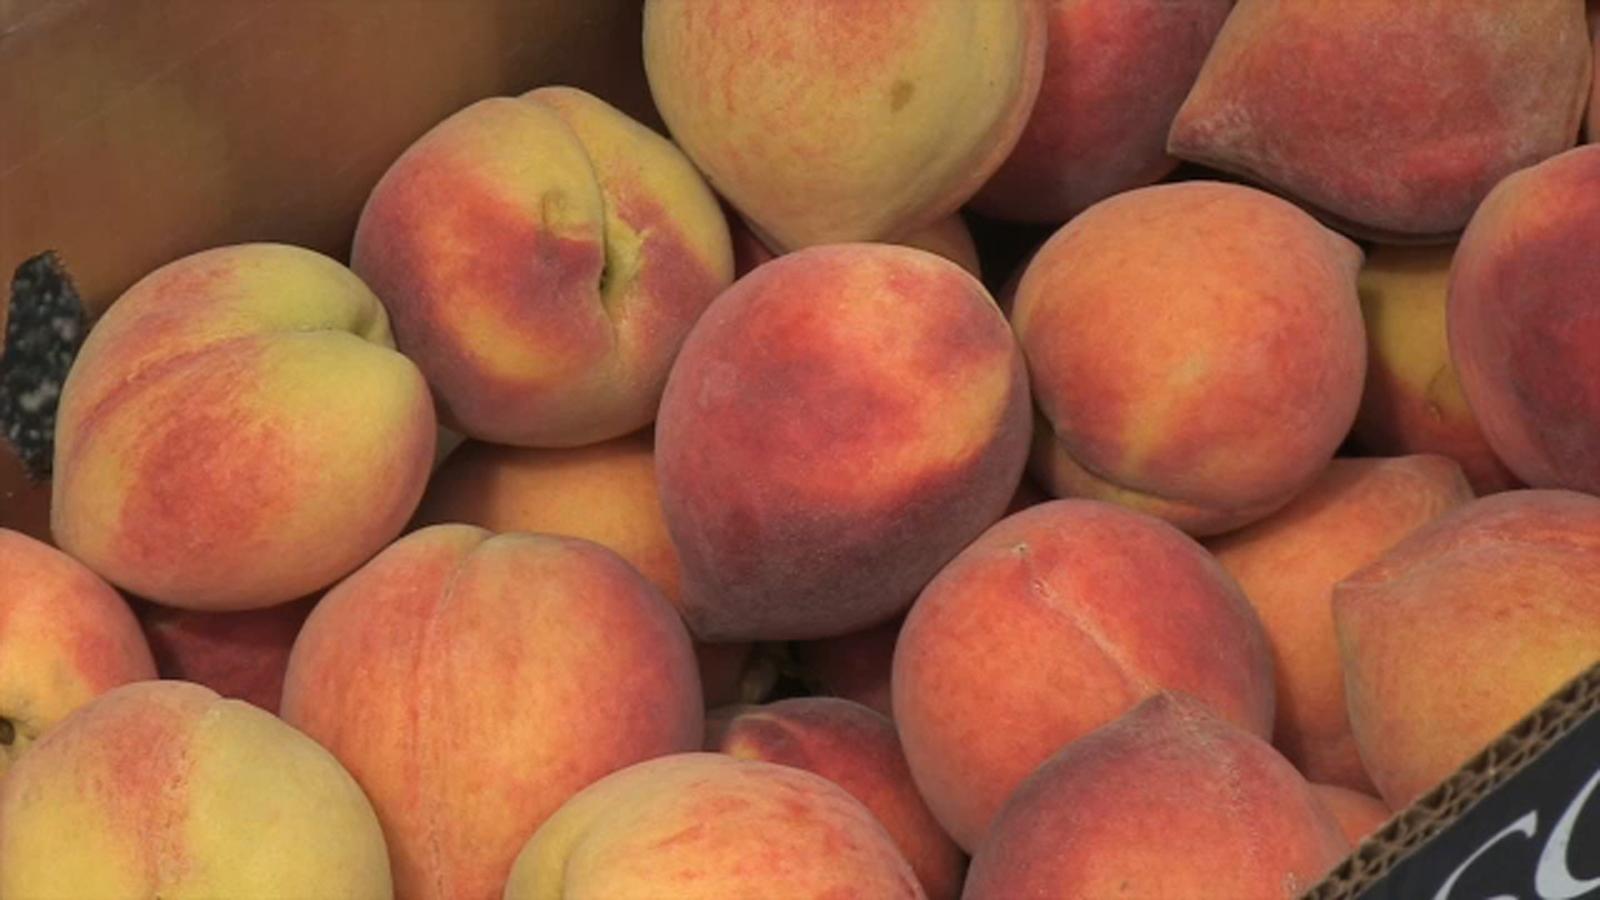 Chicago peach